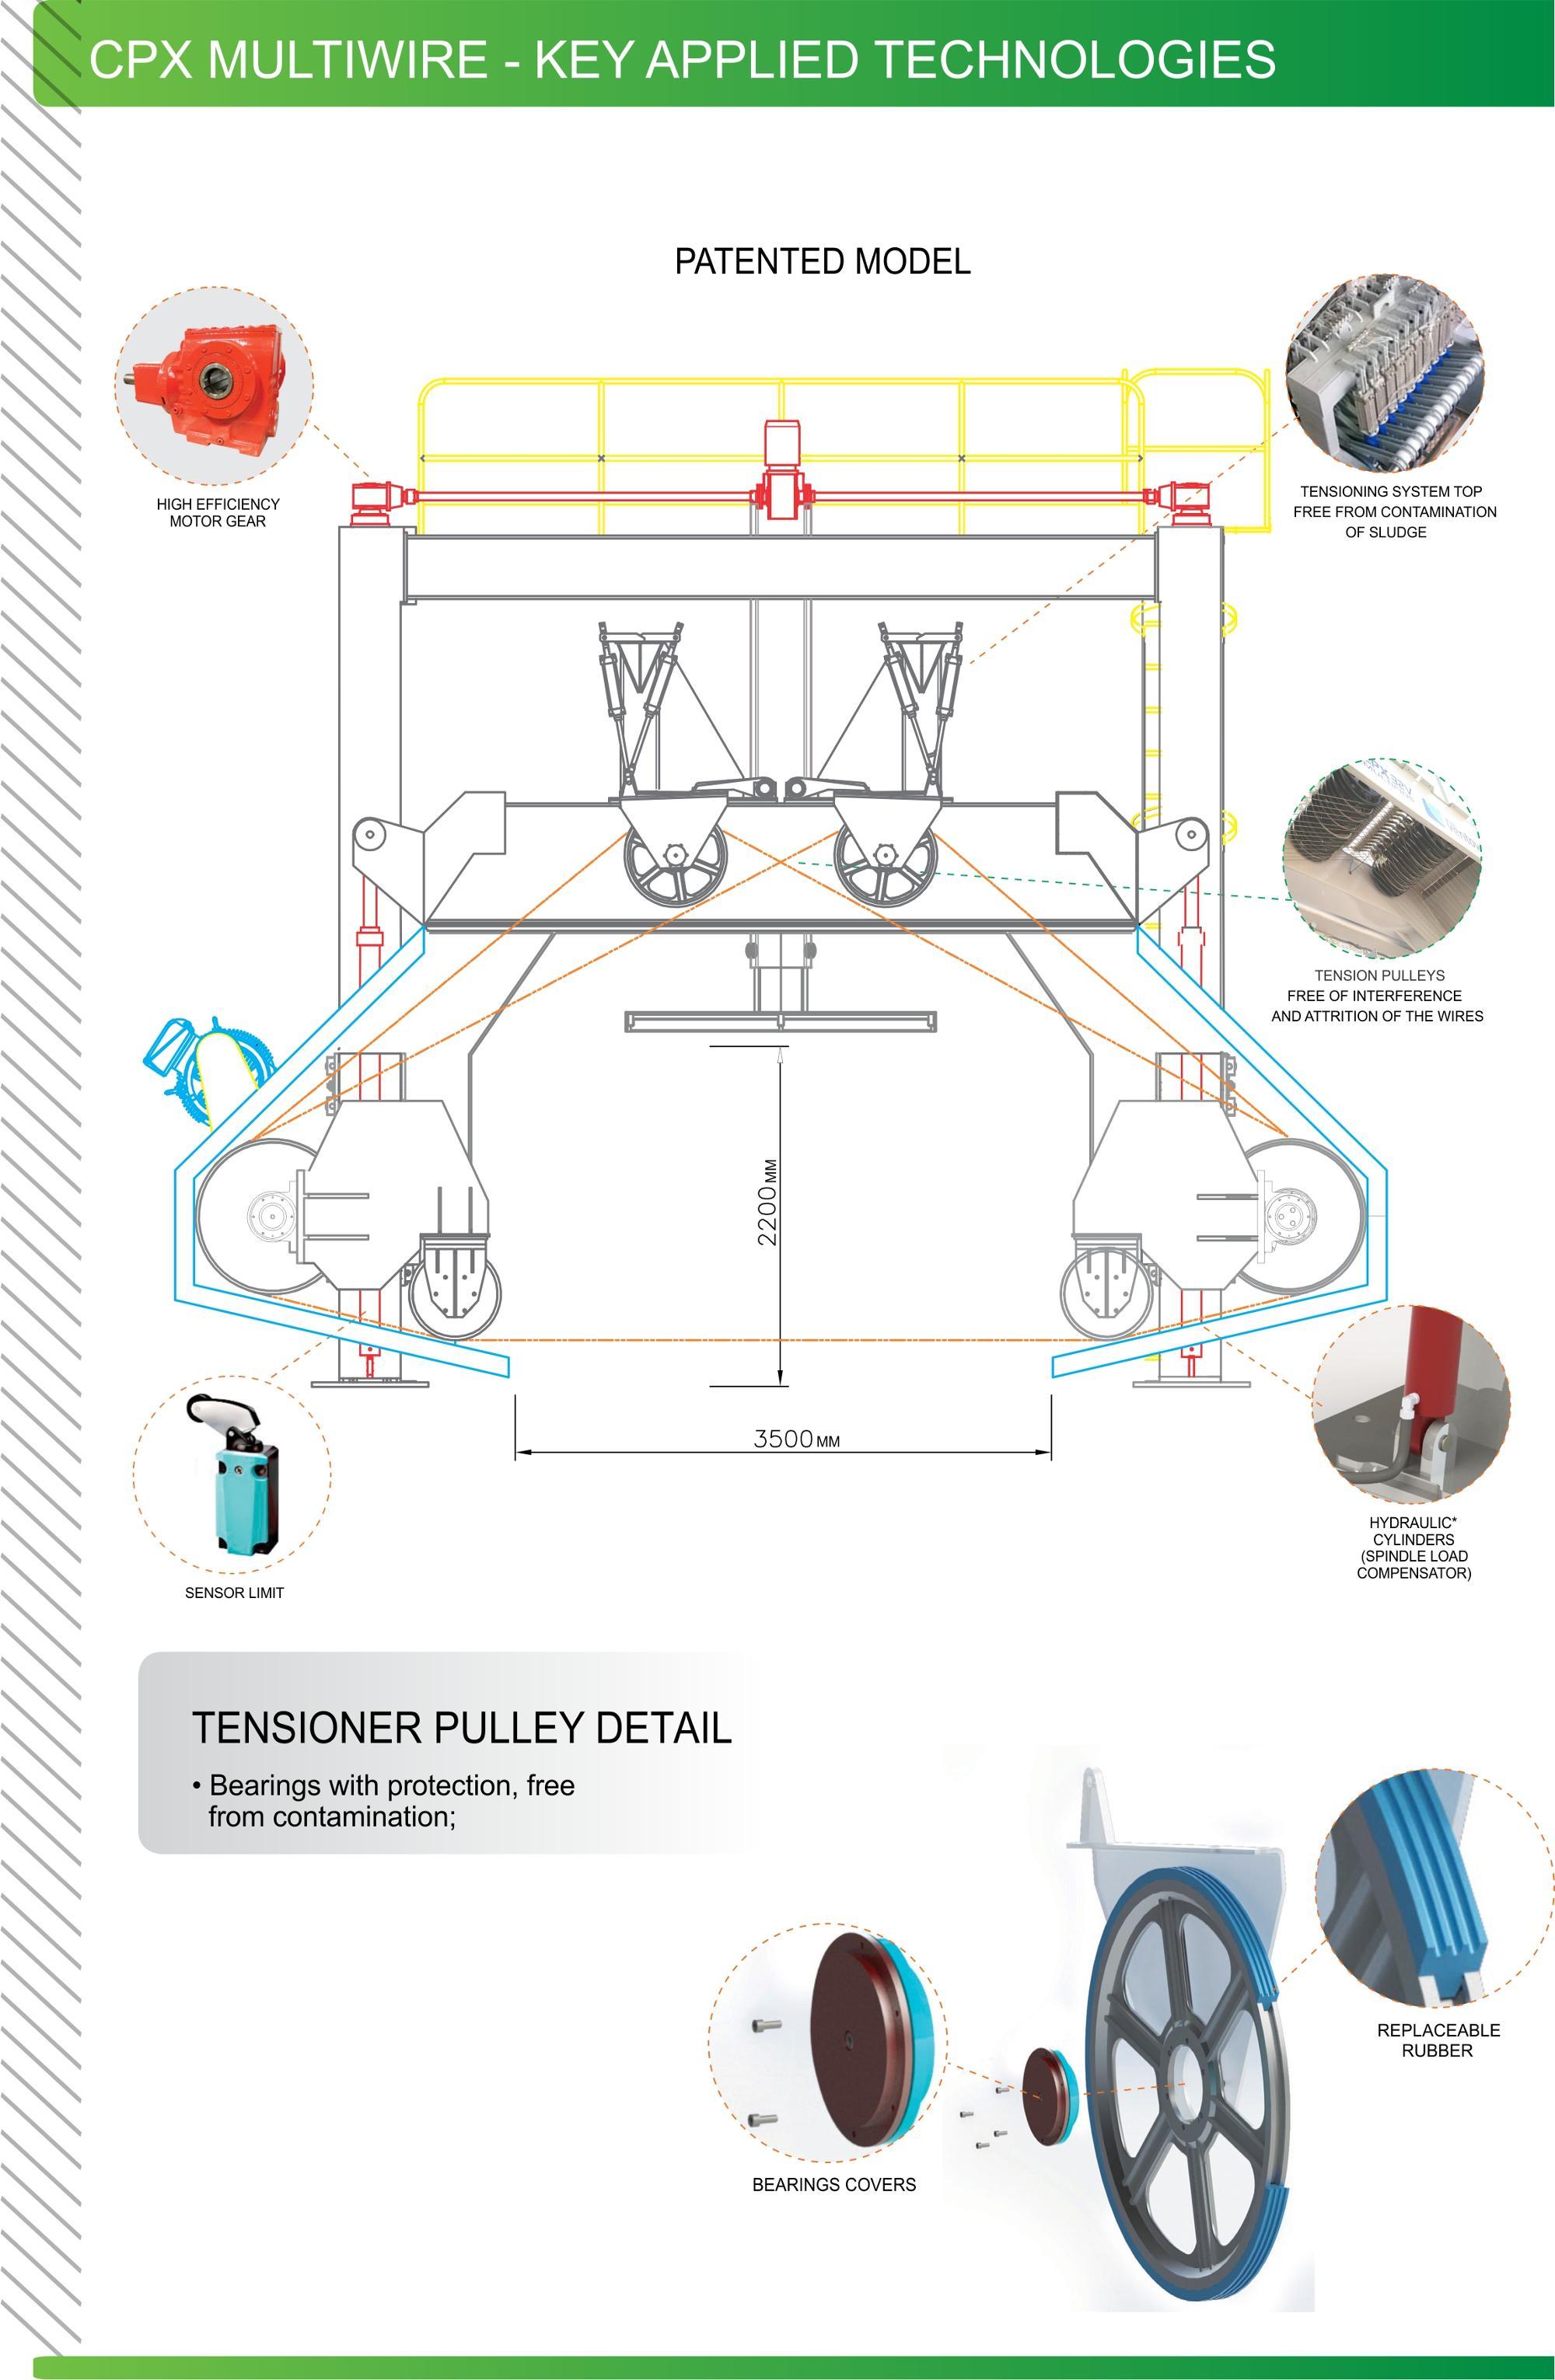 Multiwire Saw Machine For Marble And Granite 32 Wires Buy Multi Wire Diagram Tecnologias Aplicadas Tear